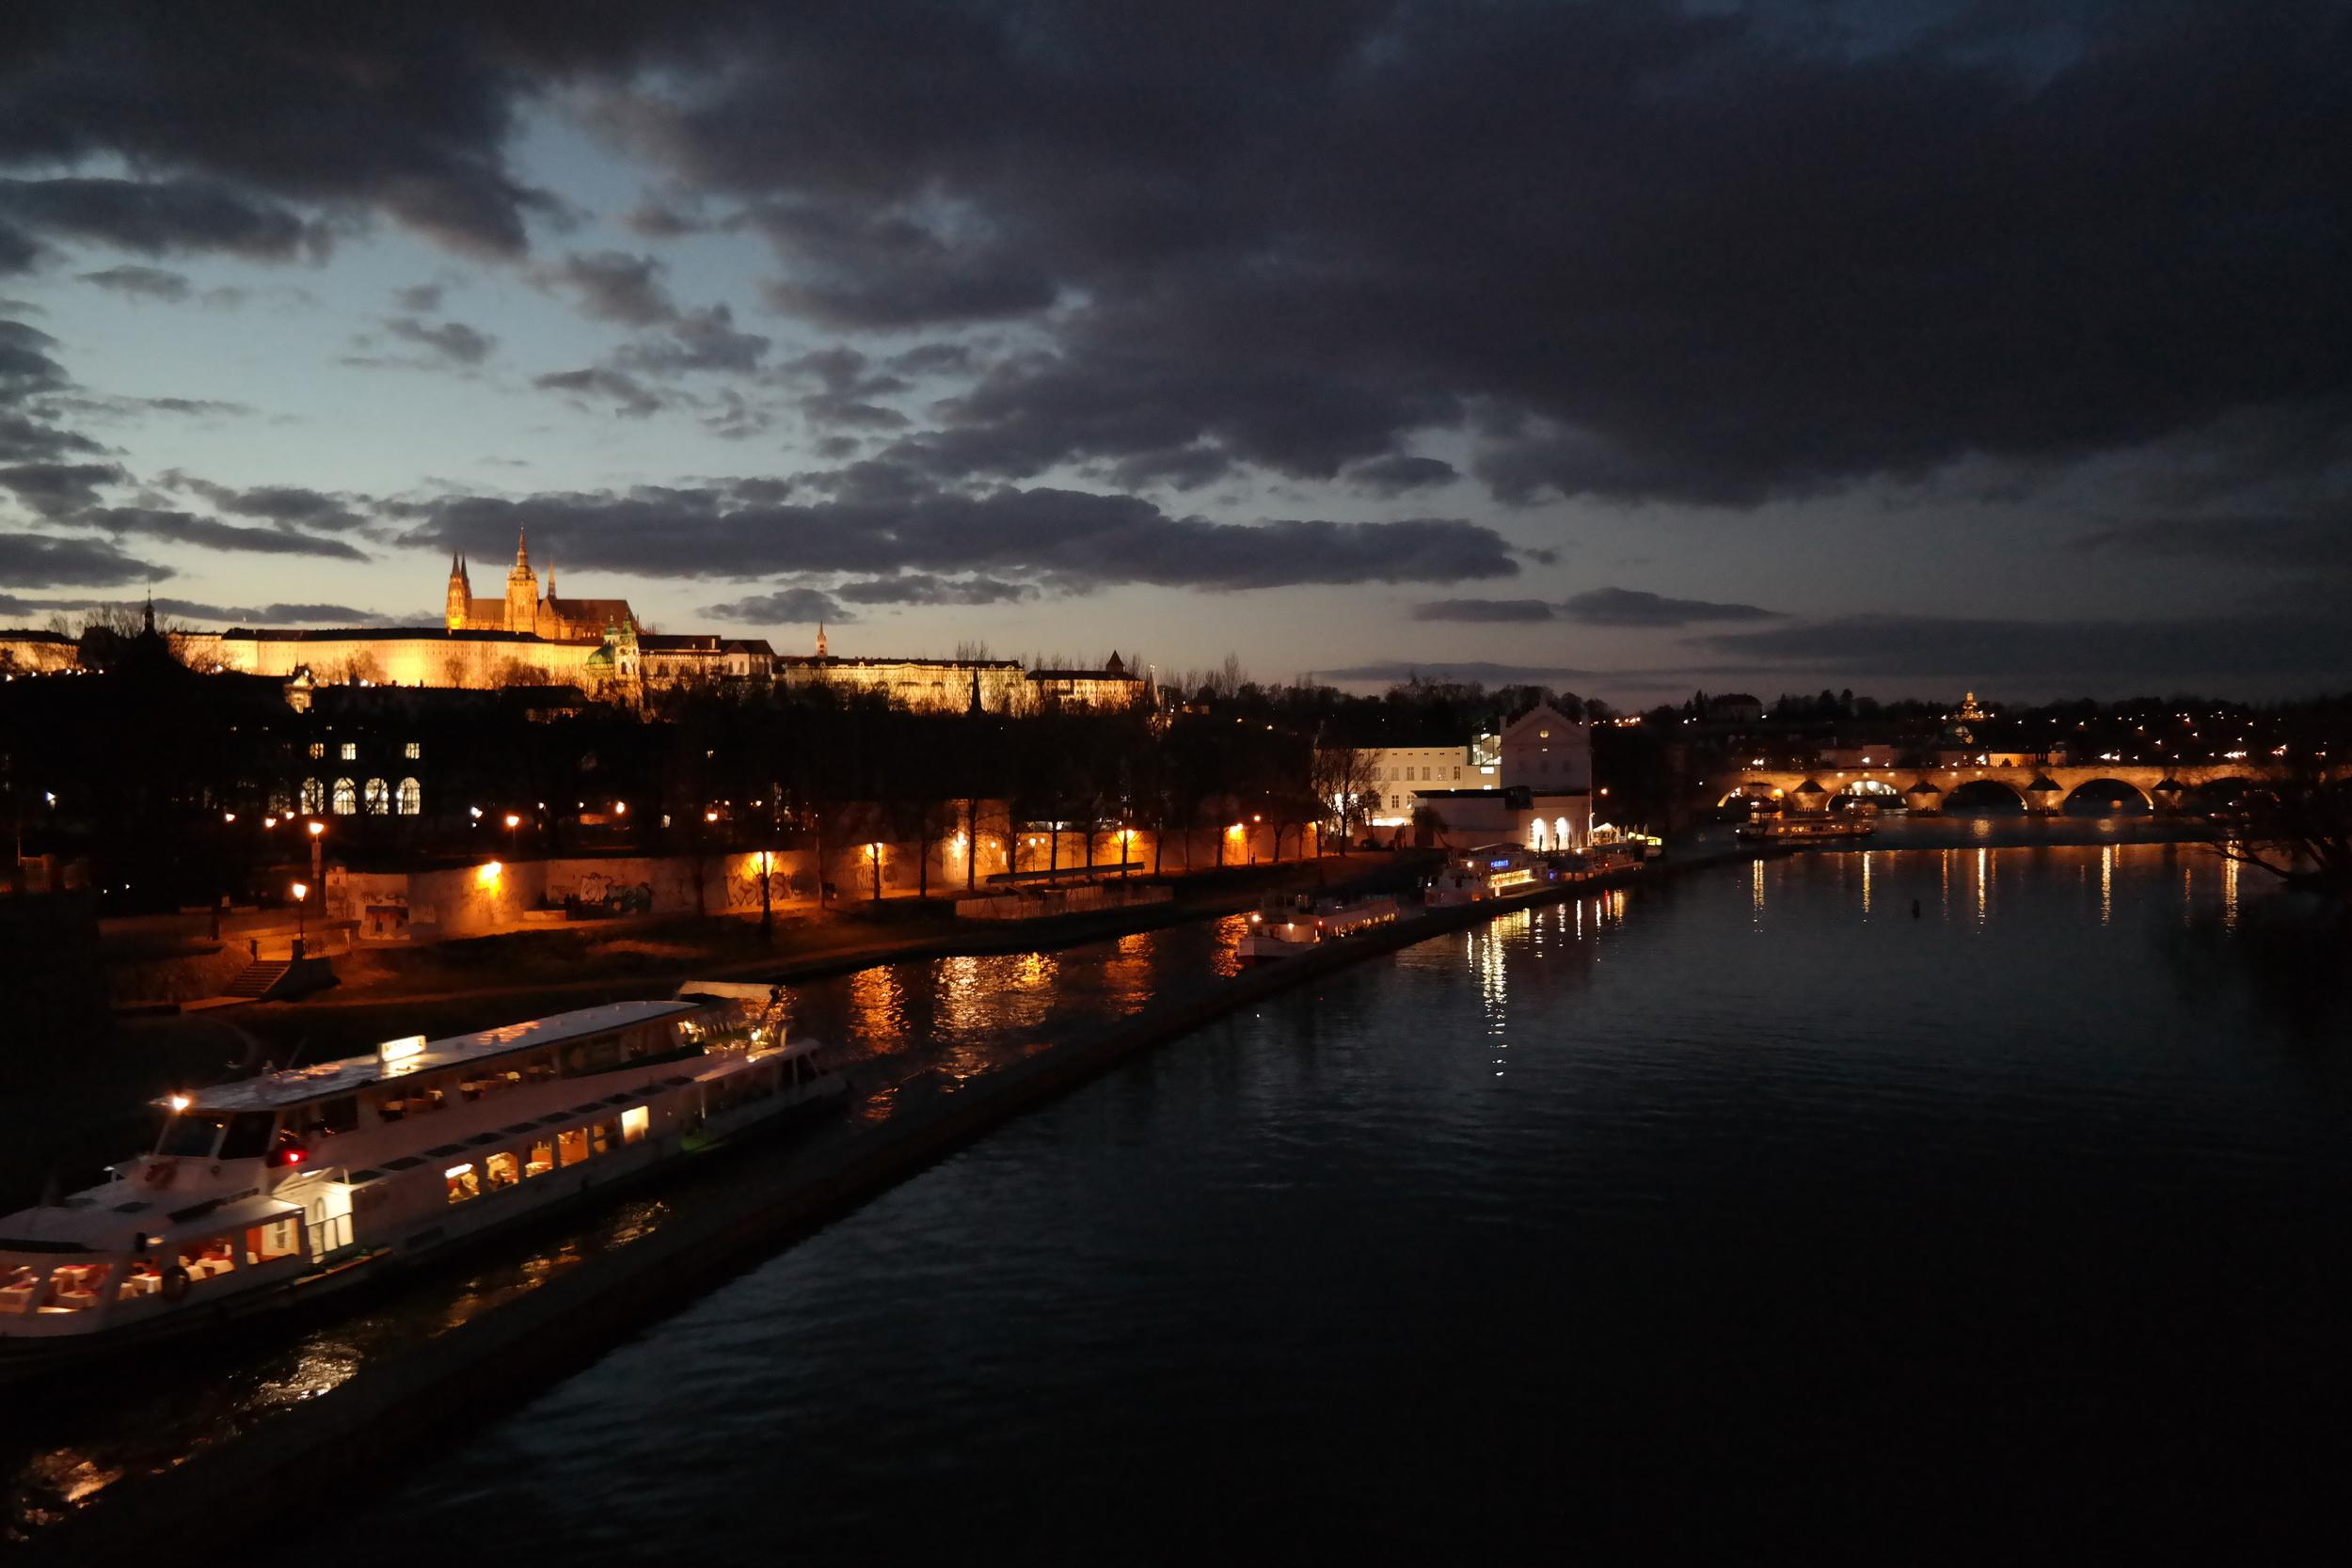 Prague, Czech Republic at night. Yes, it is as beautiful as it looks!